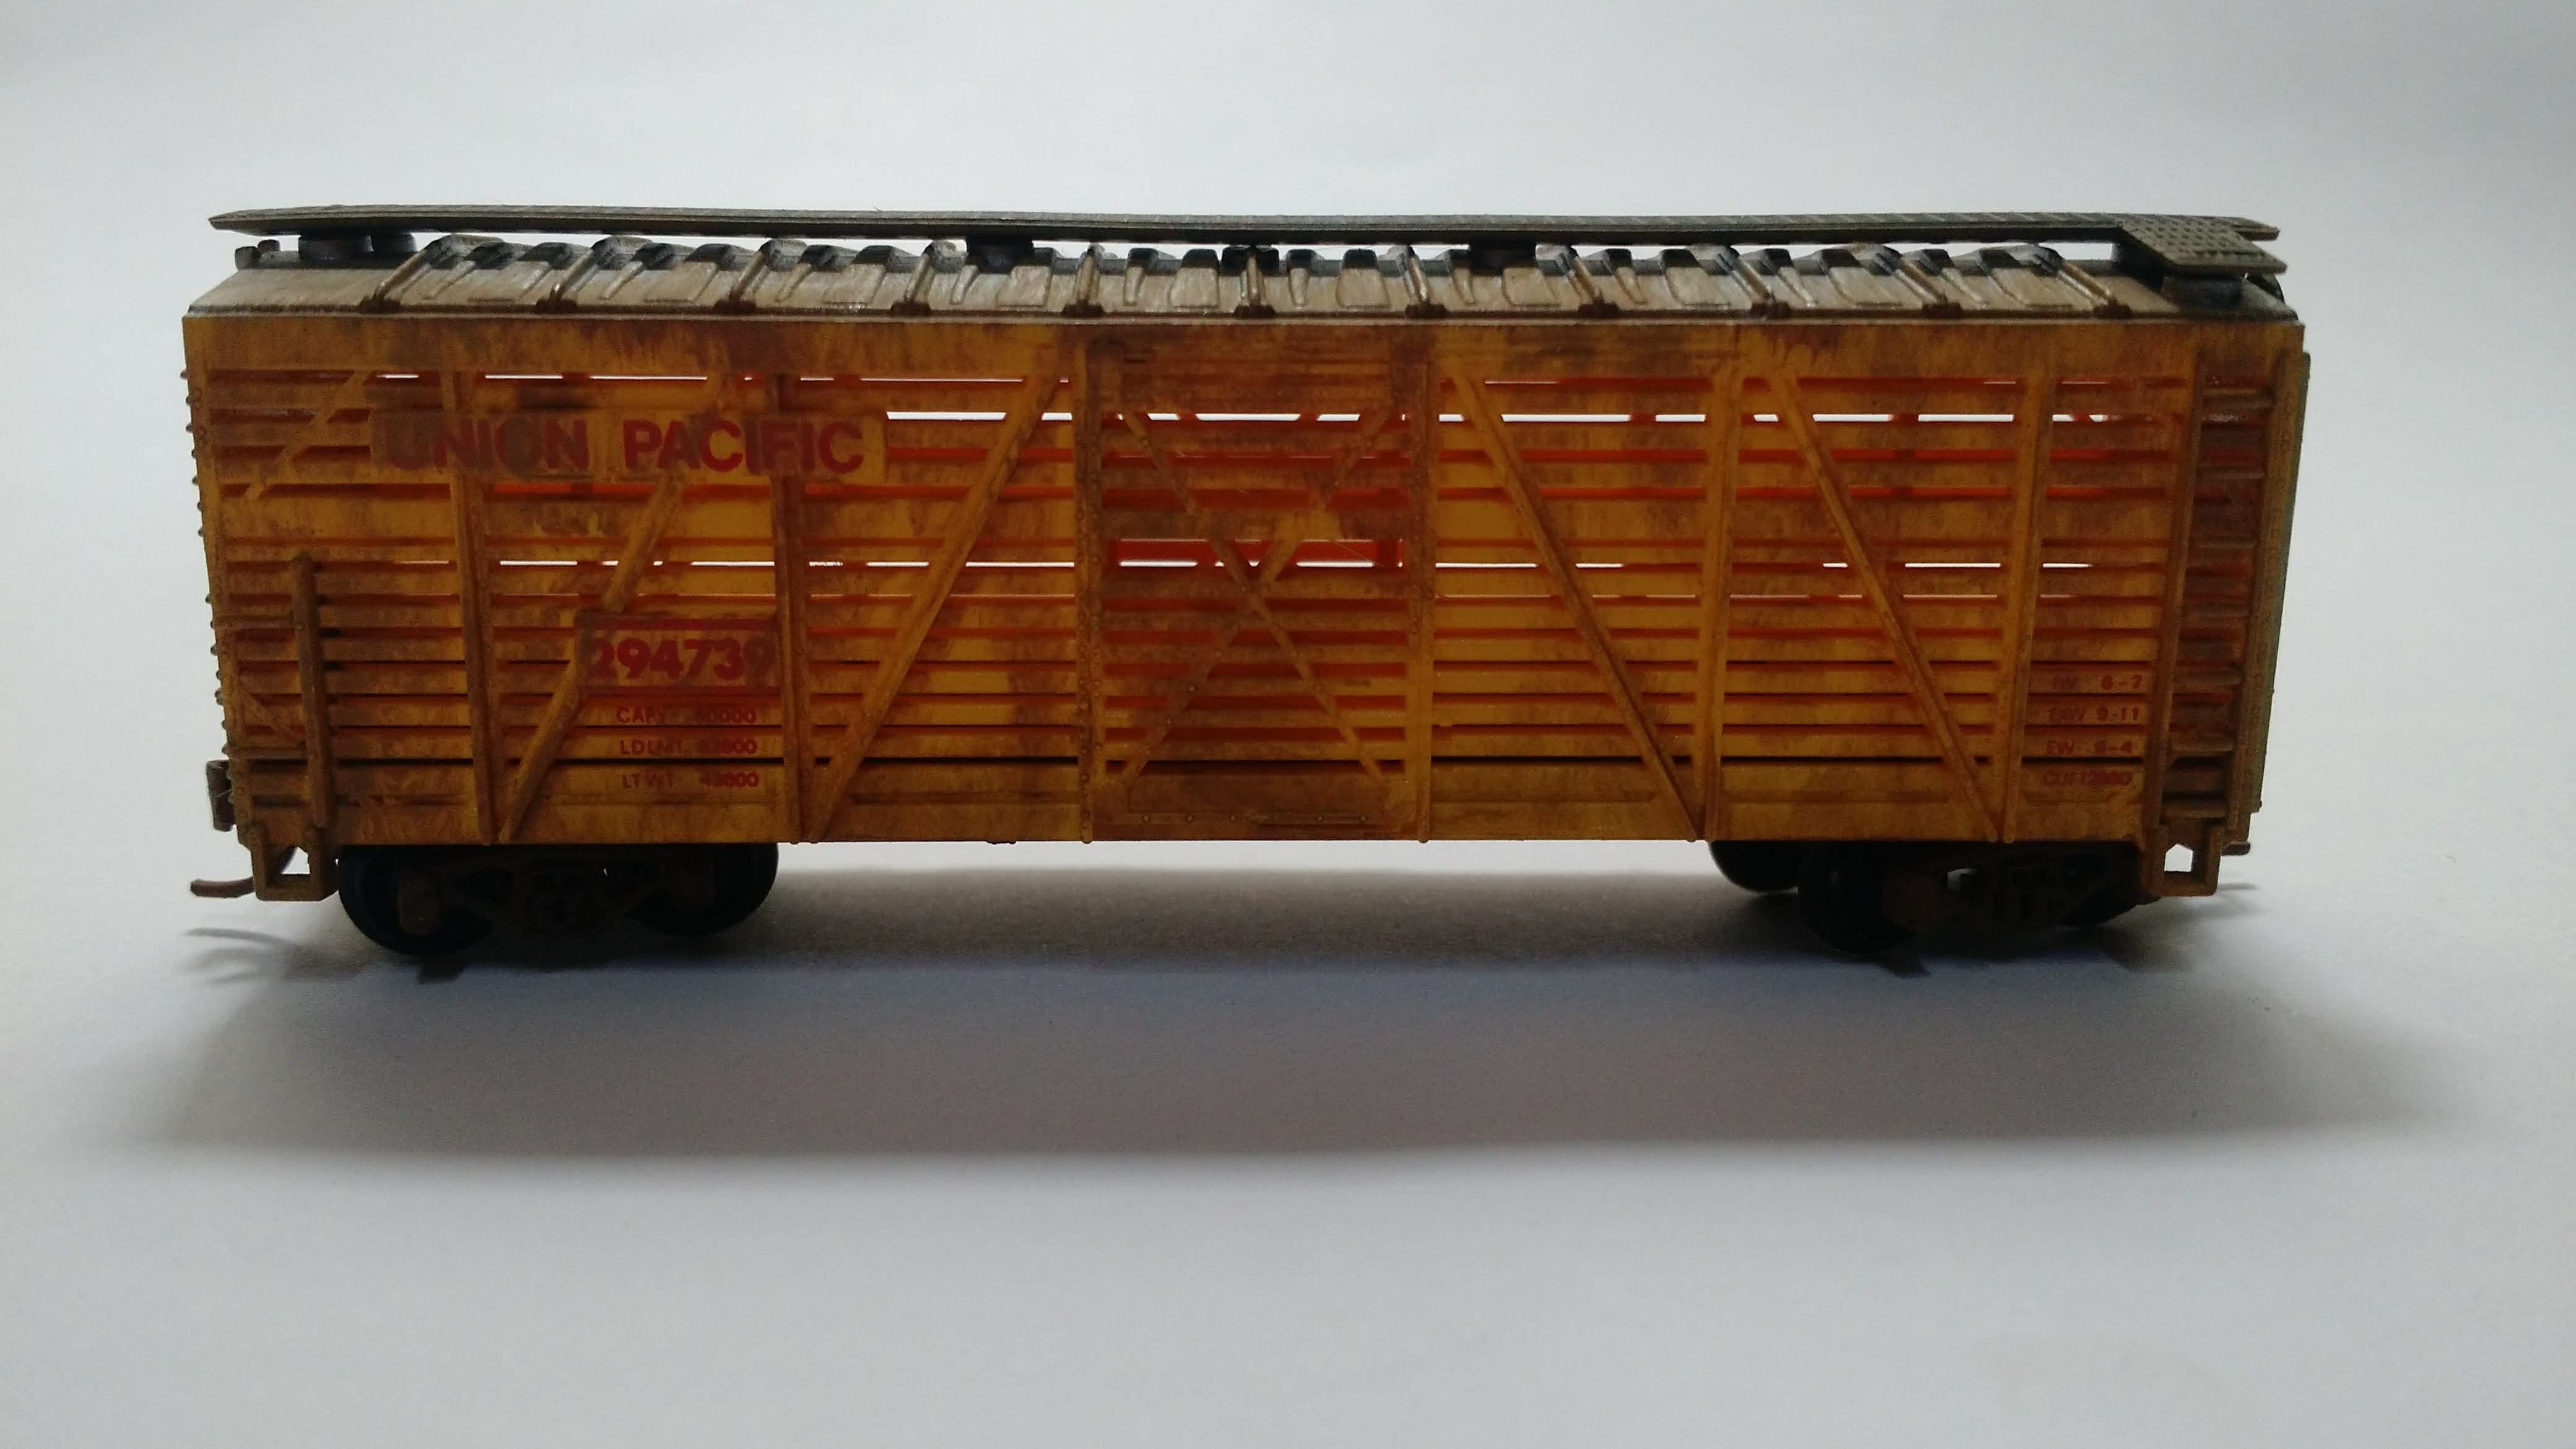 Vagão Stck 40' Union Pacific - Model Power - 3442